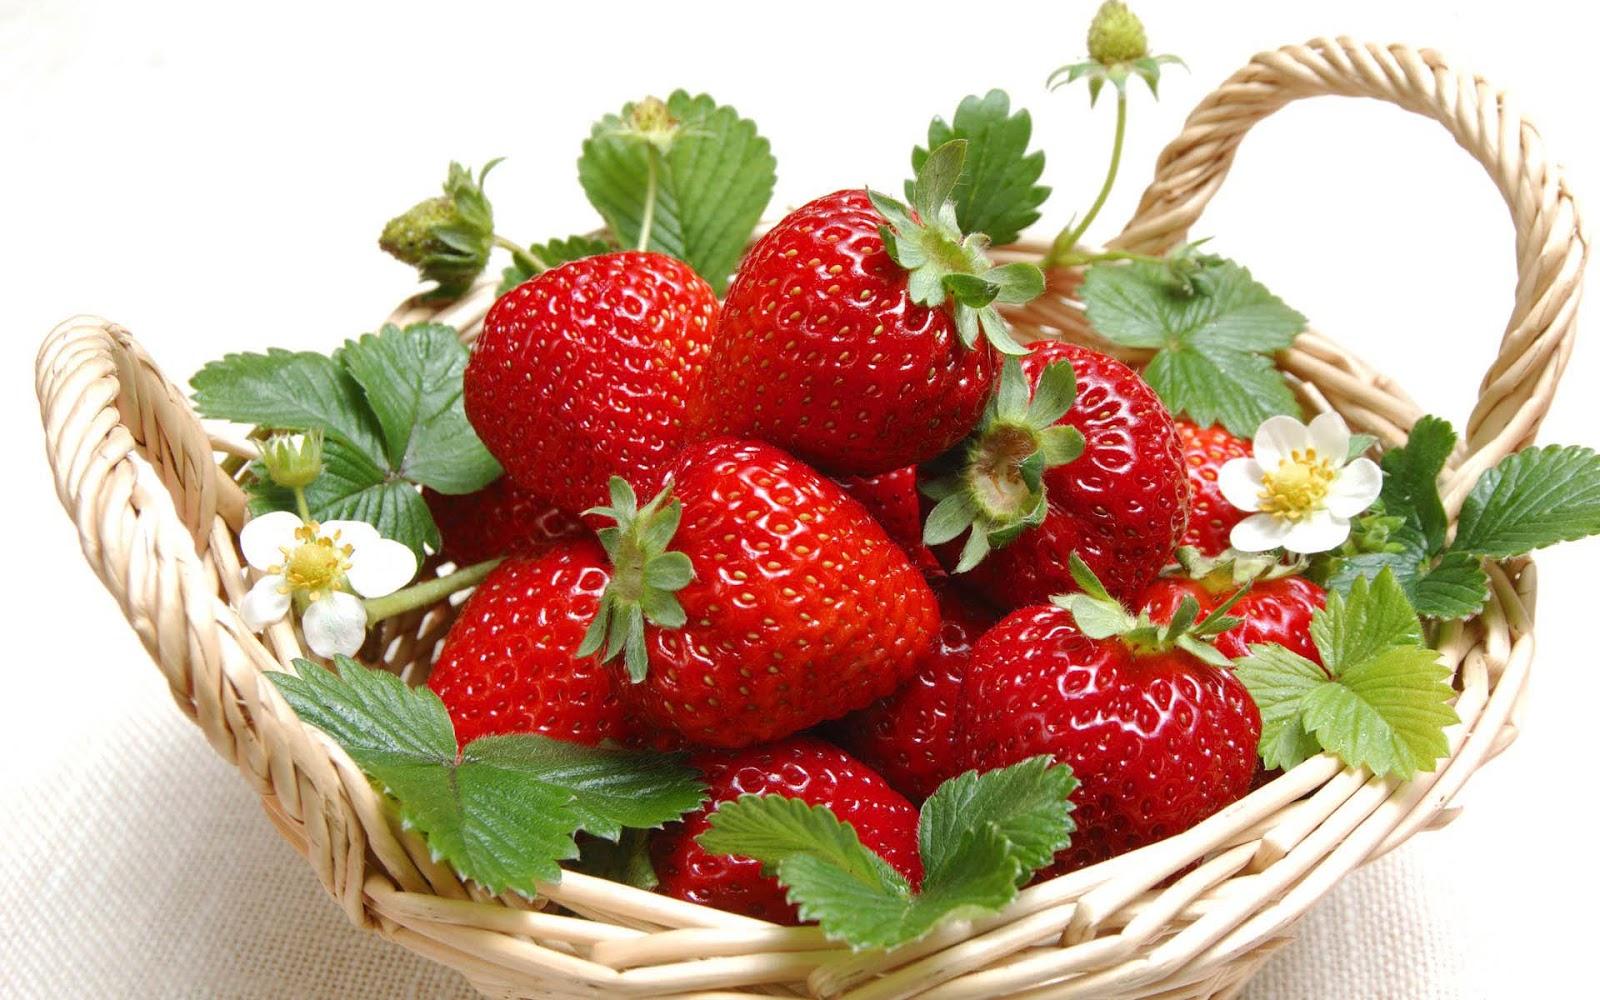 Fruit wallpaper download free - A Original Strawberry Images